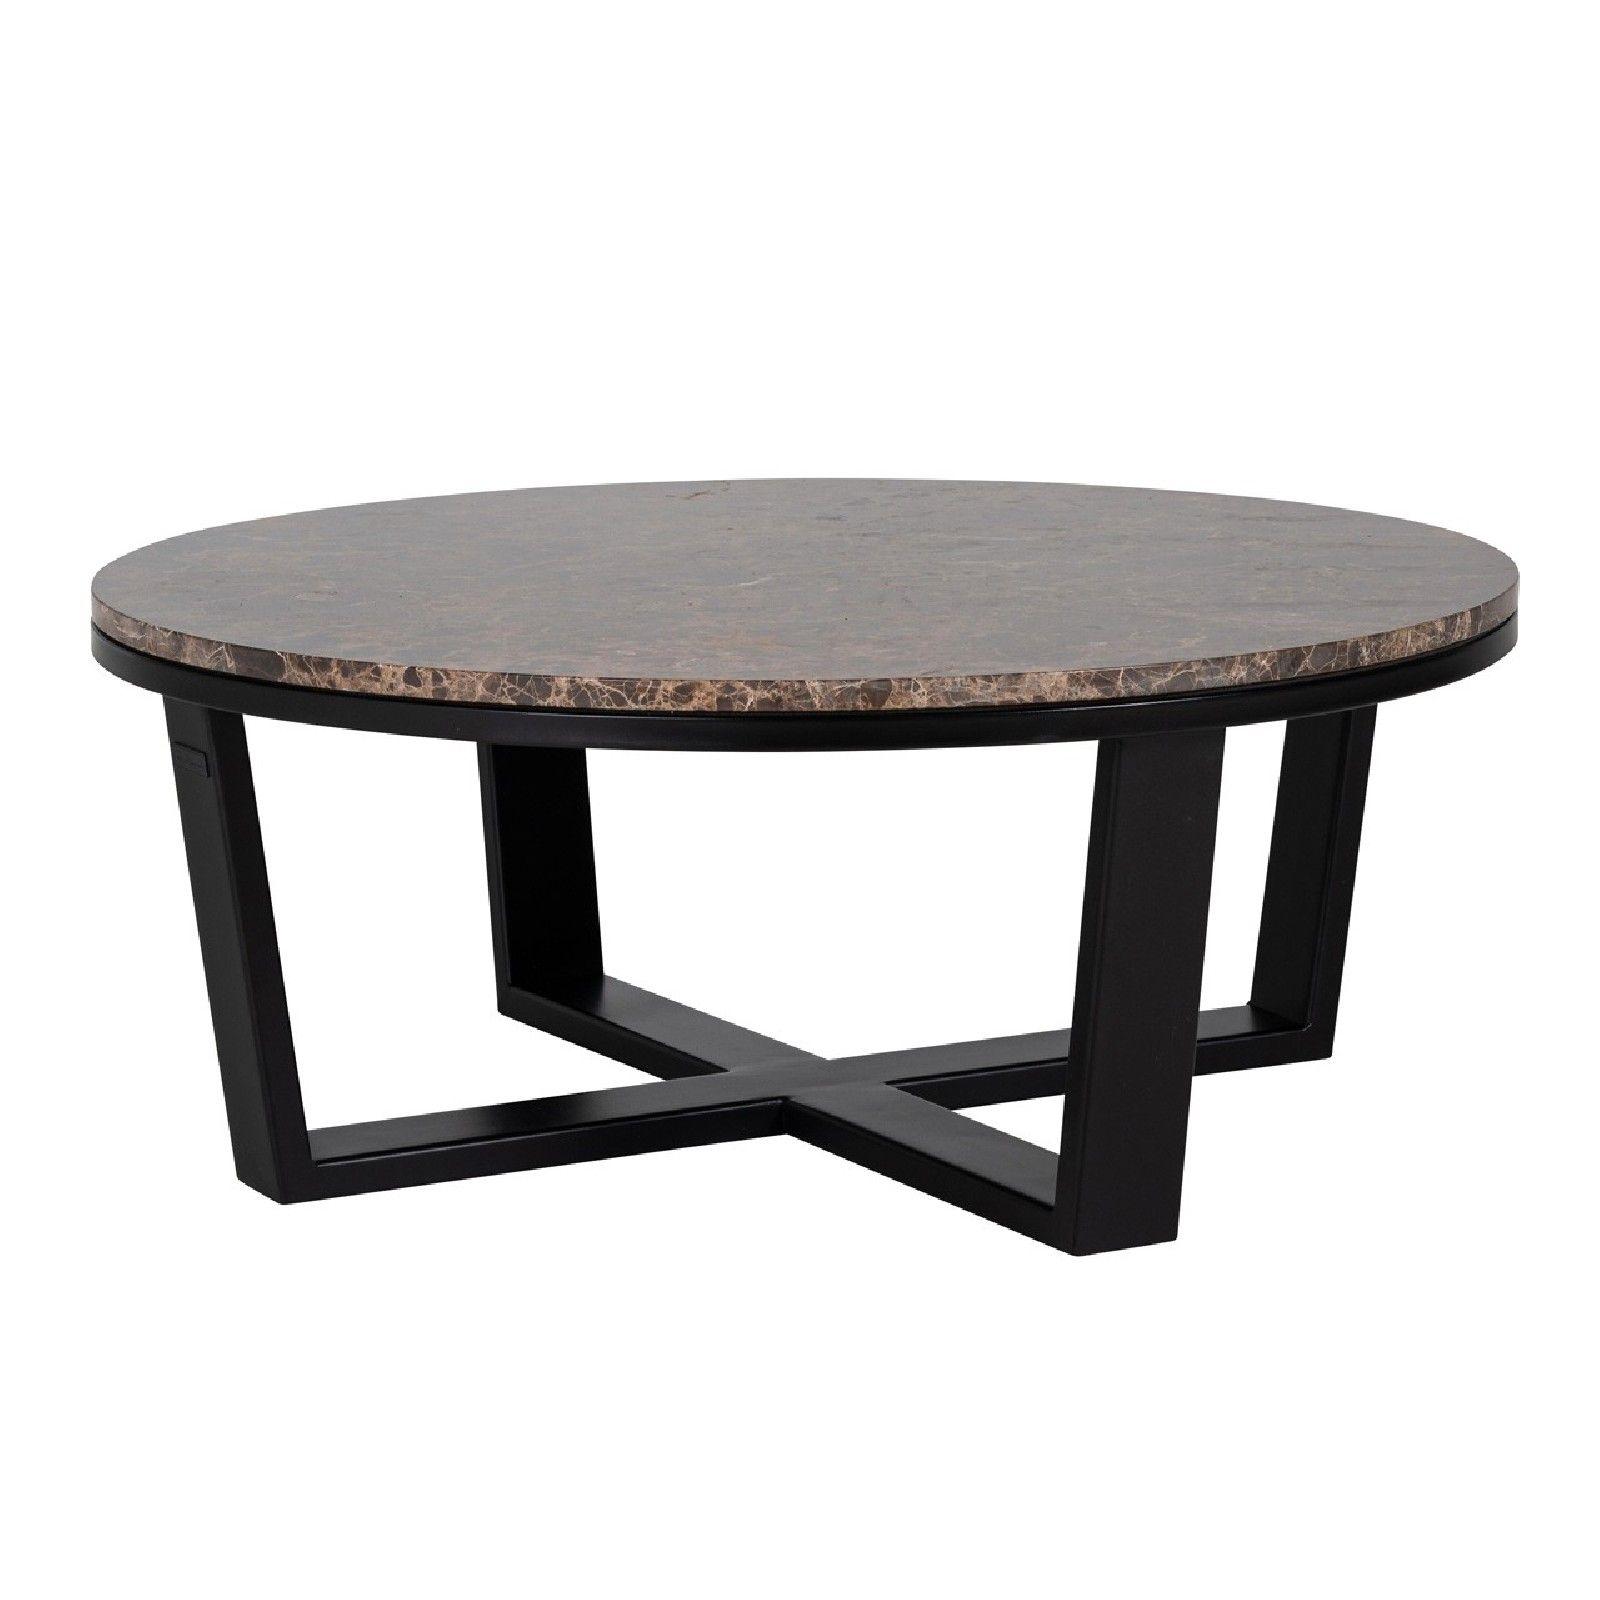 "Table basse ronde 90Ø - Fer et marbre brun empereur ""Dalton"" Tables basses rondes - 811"